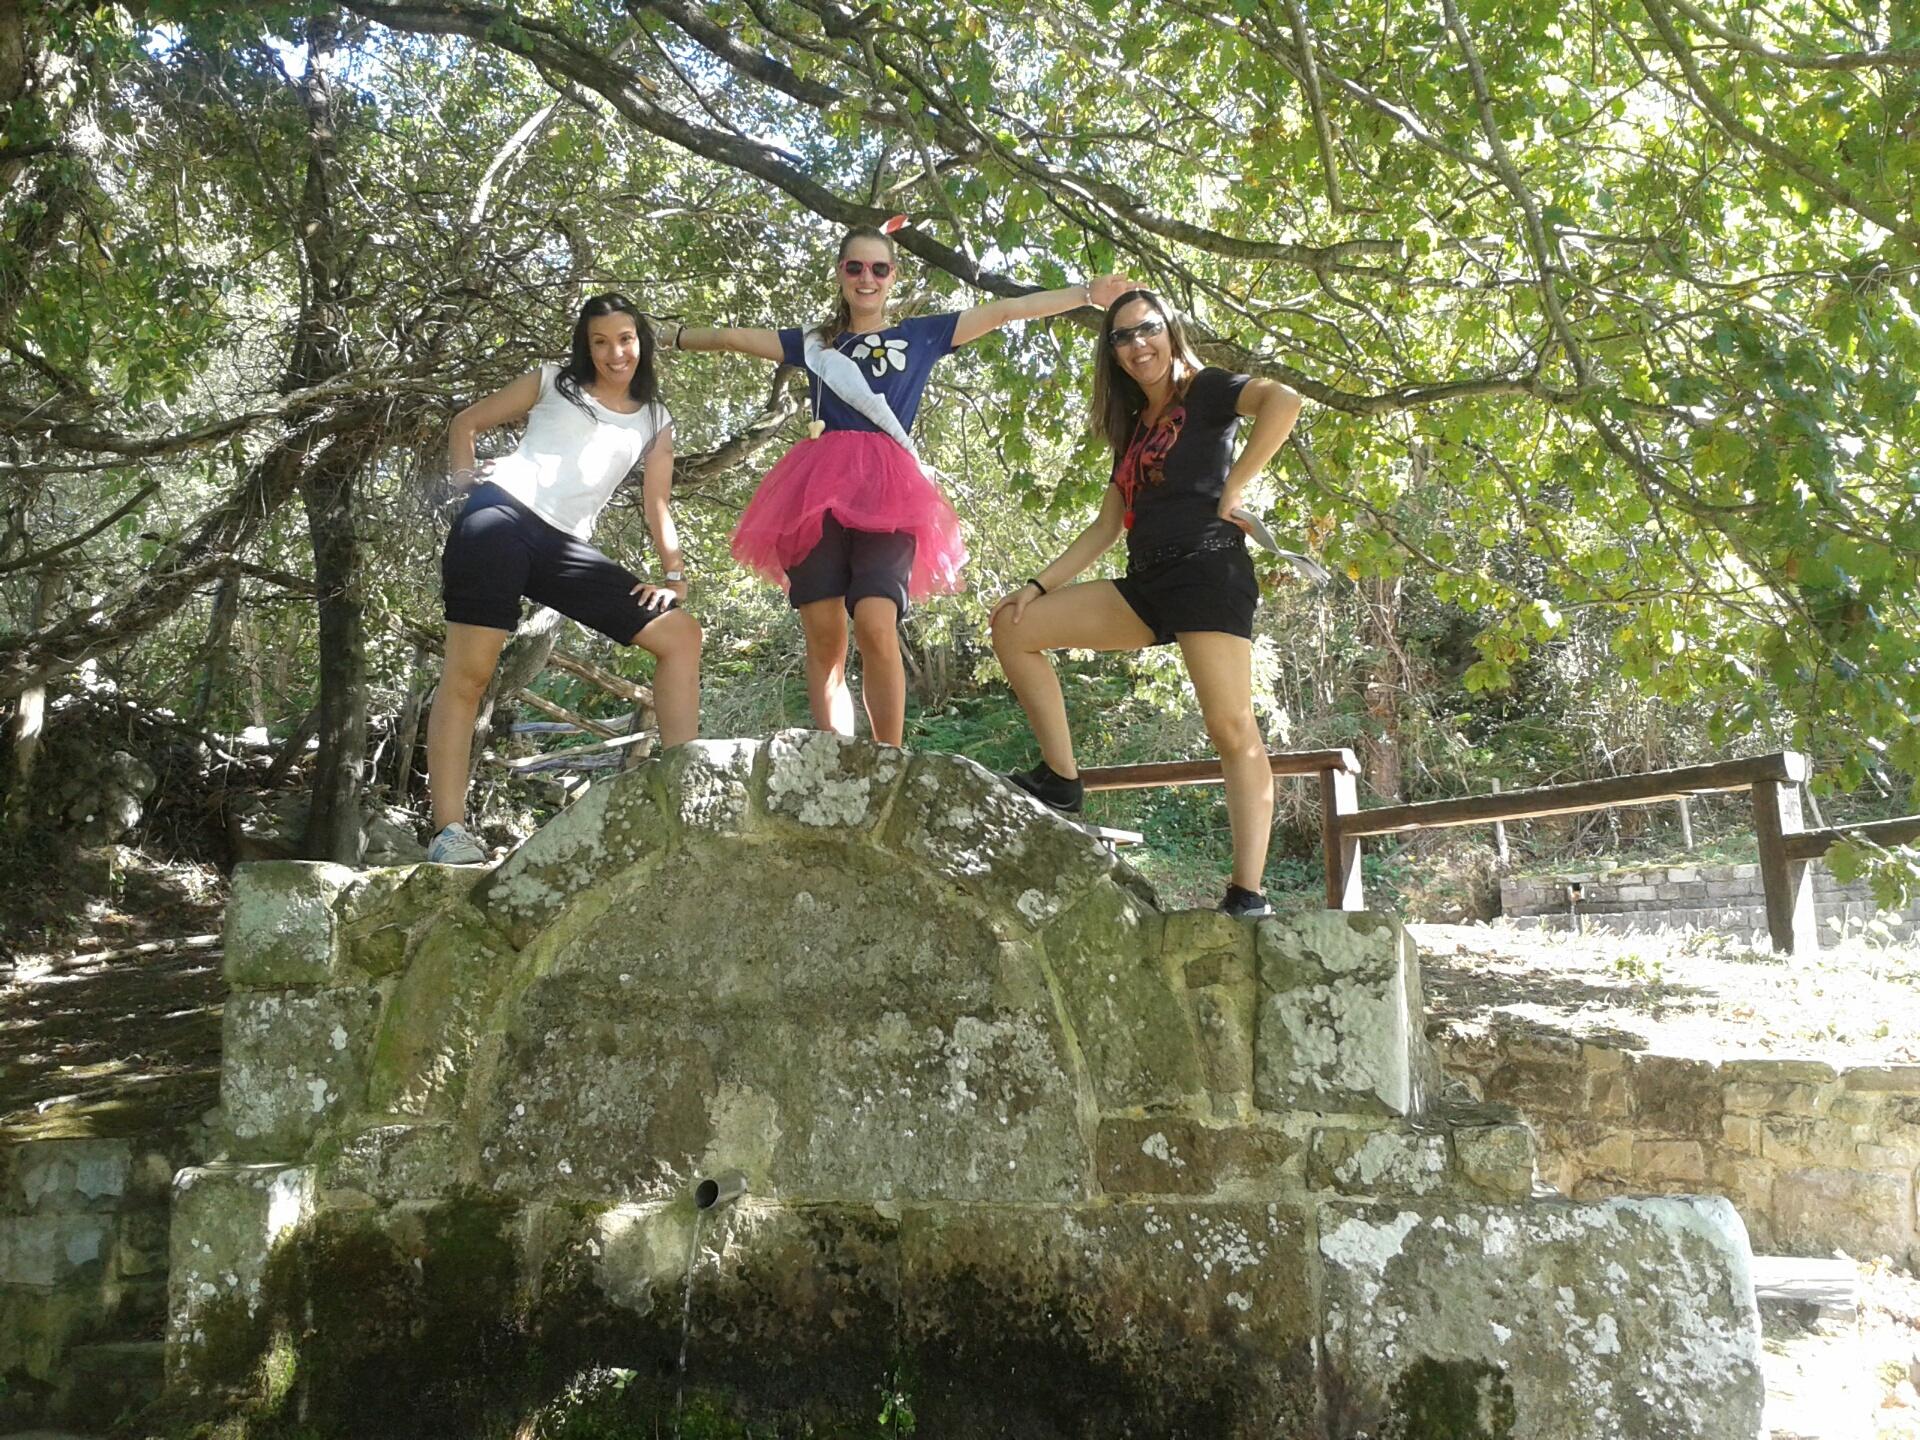 Despedidas_5_soltero_soltera_Cantabria_Parque_multiaventura_ocio_juegos_cabuerniaventura